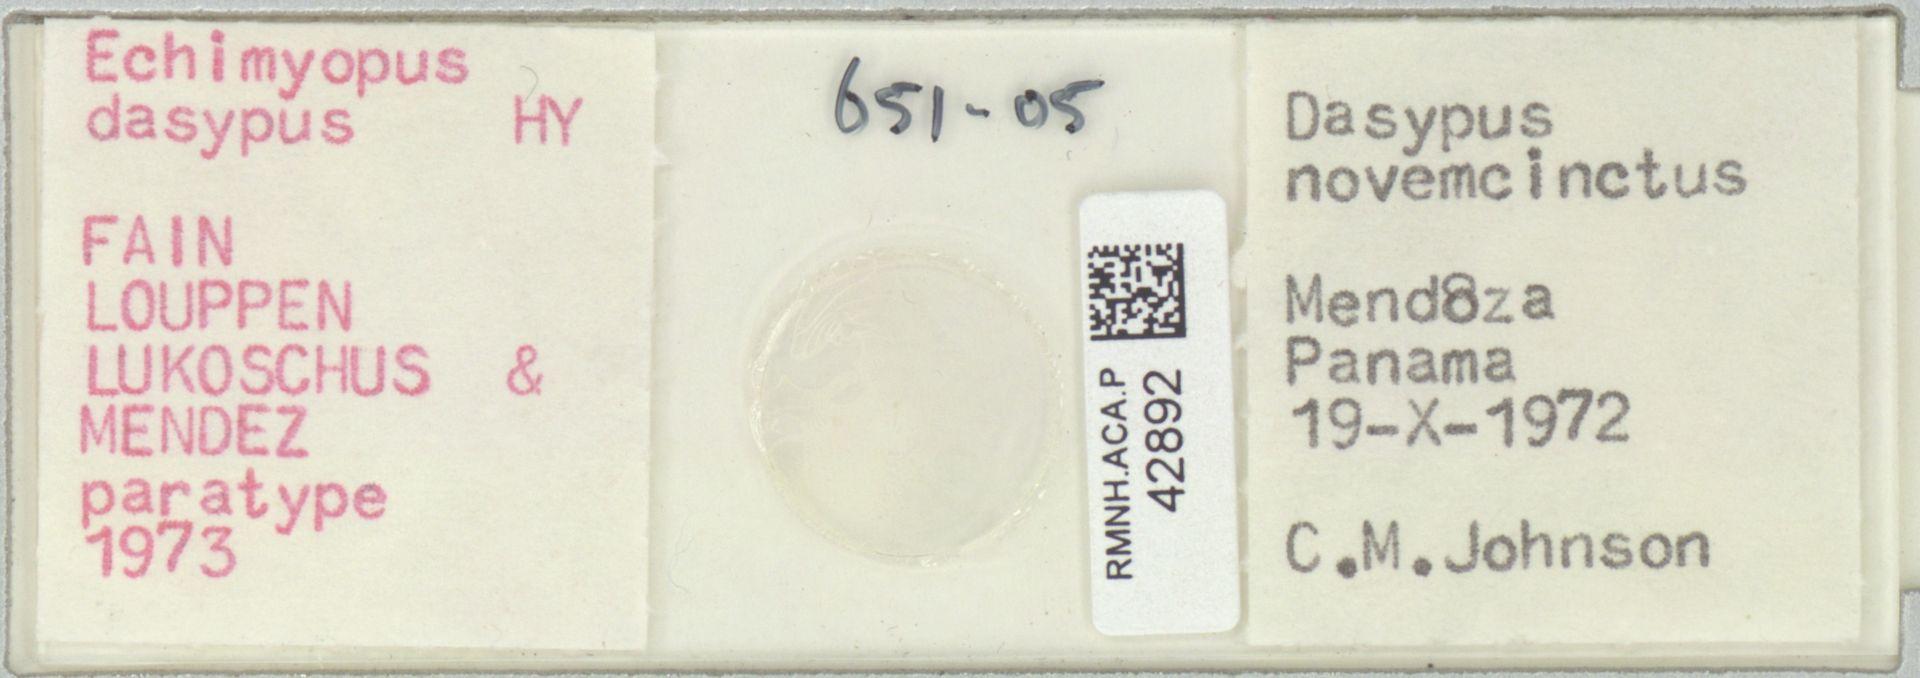 RMNH.ACA.P.42892 | Echimyopus dasypus Fain, Louppen, Lukoschus & Mendez